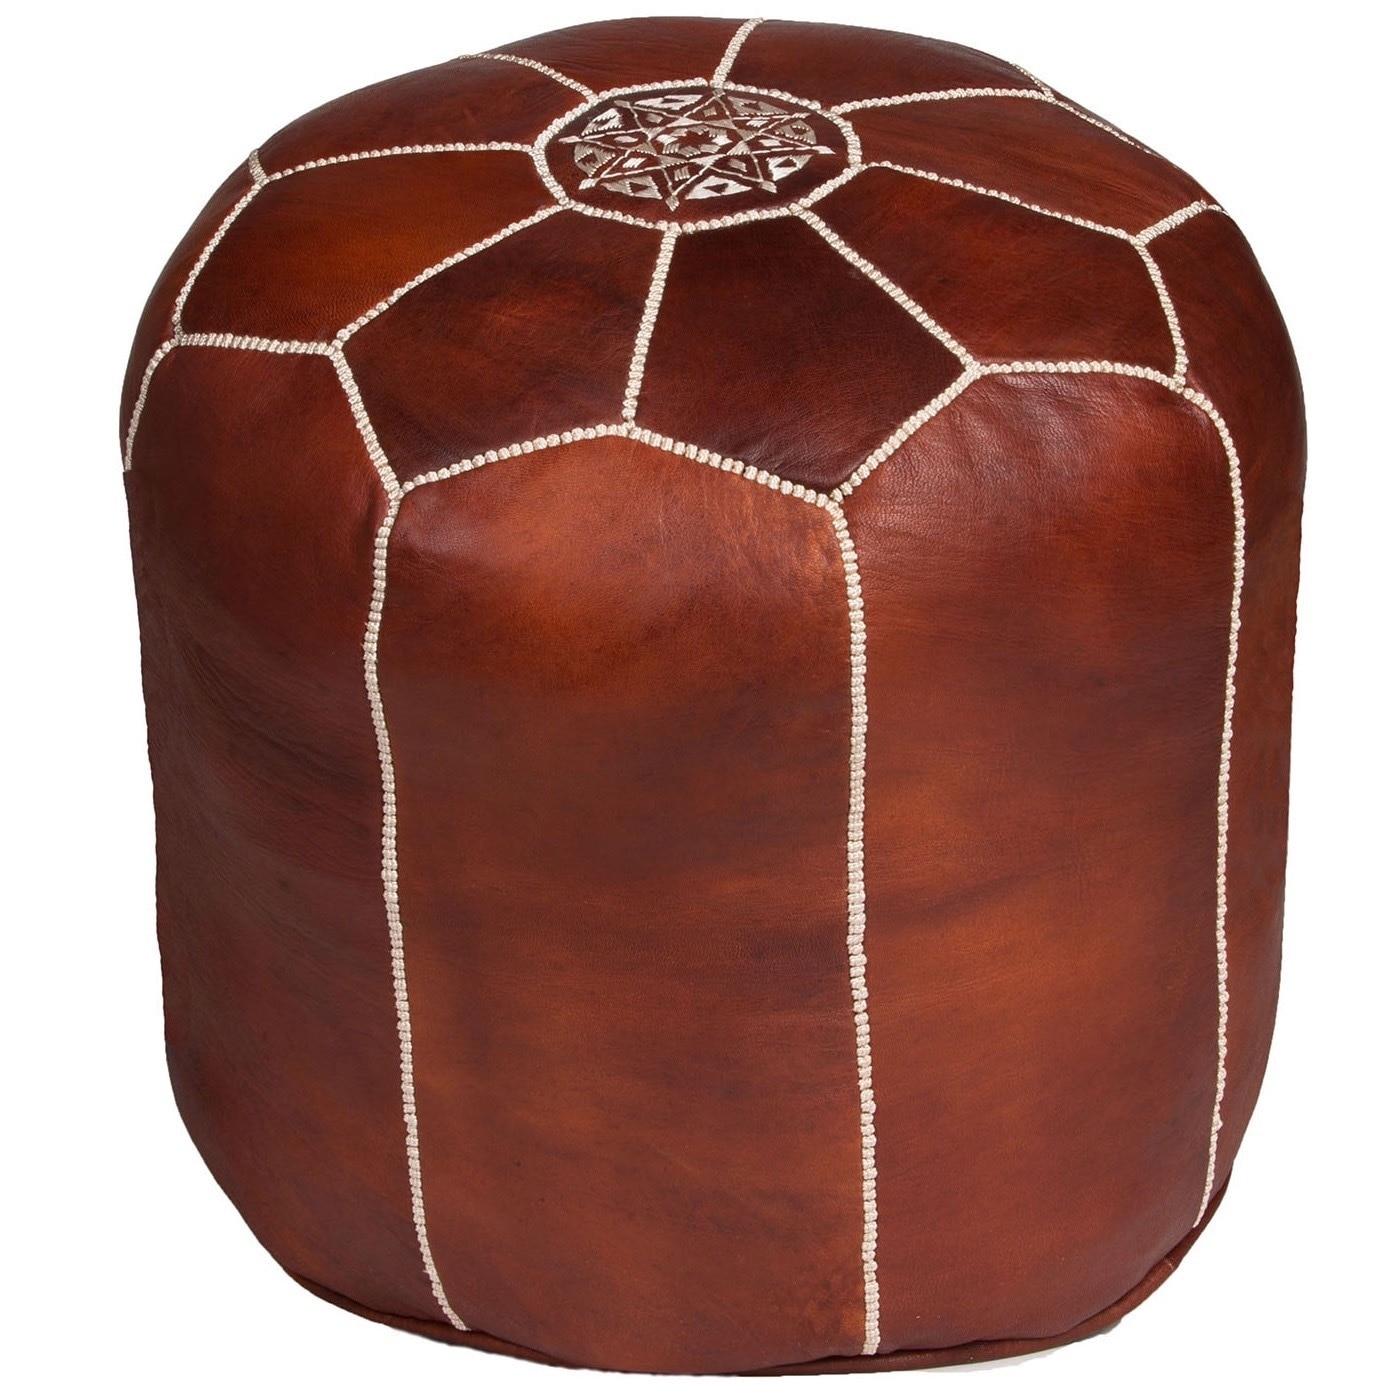 Handmade Tall Brown Moroccan Leather Ottoman Pouf (Morocc...